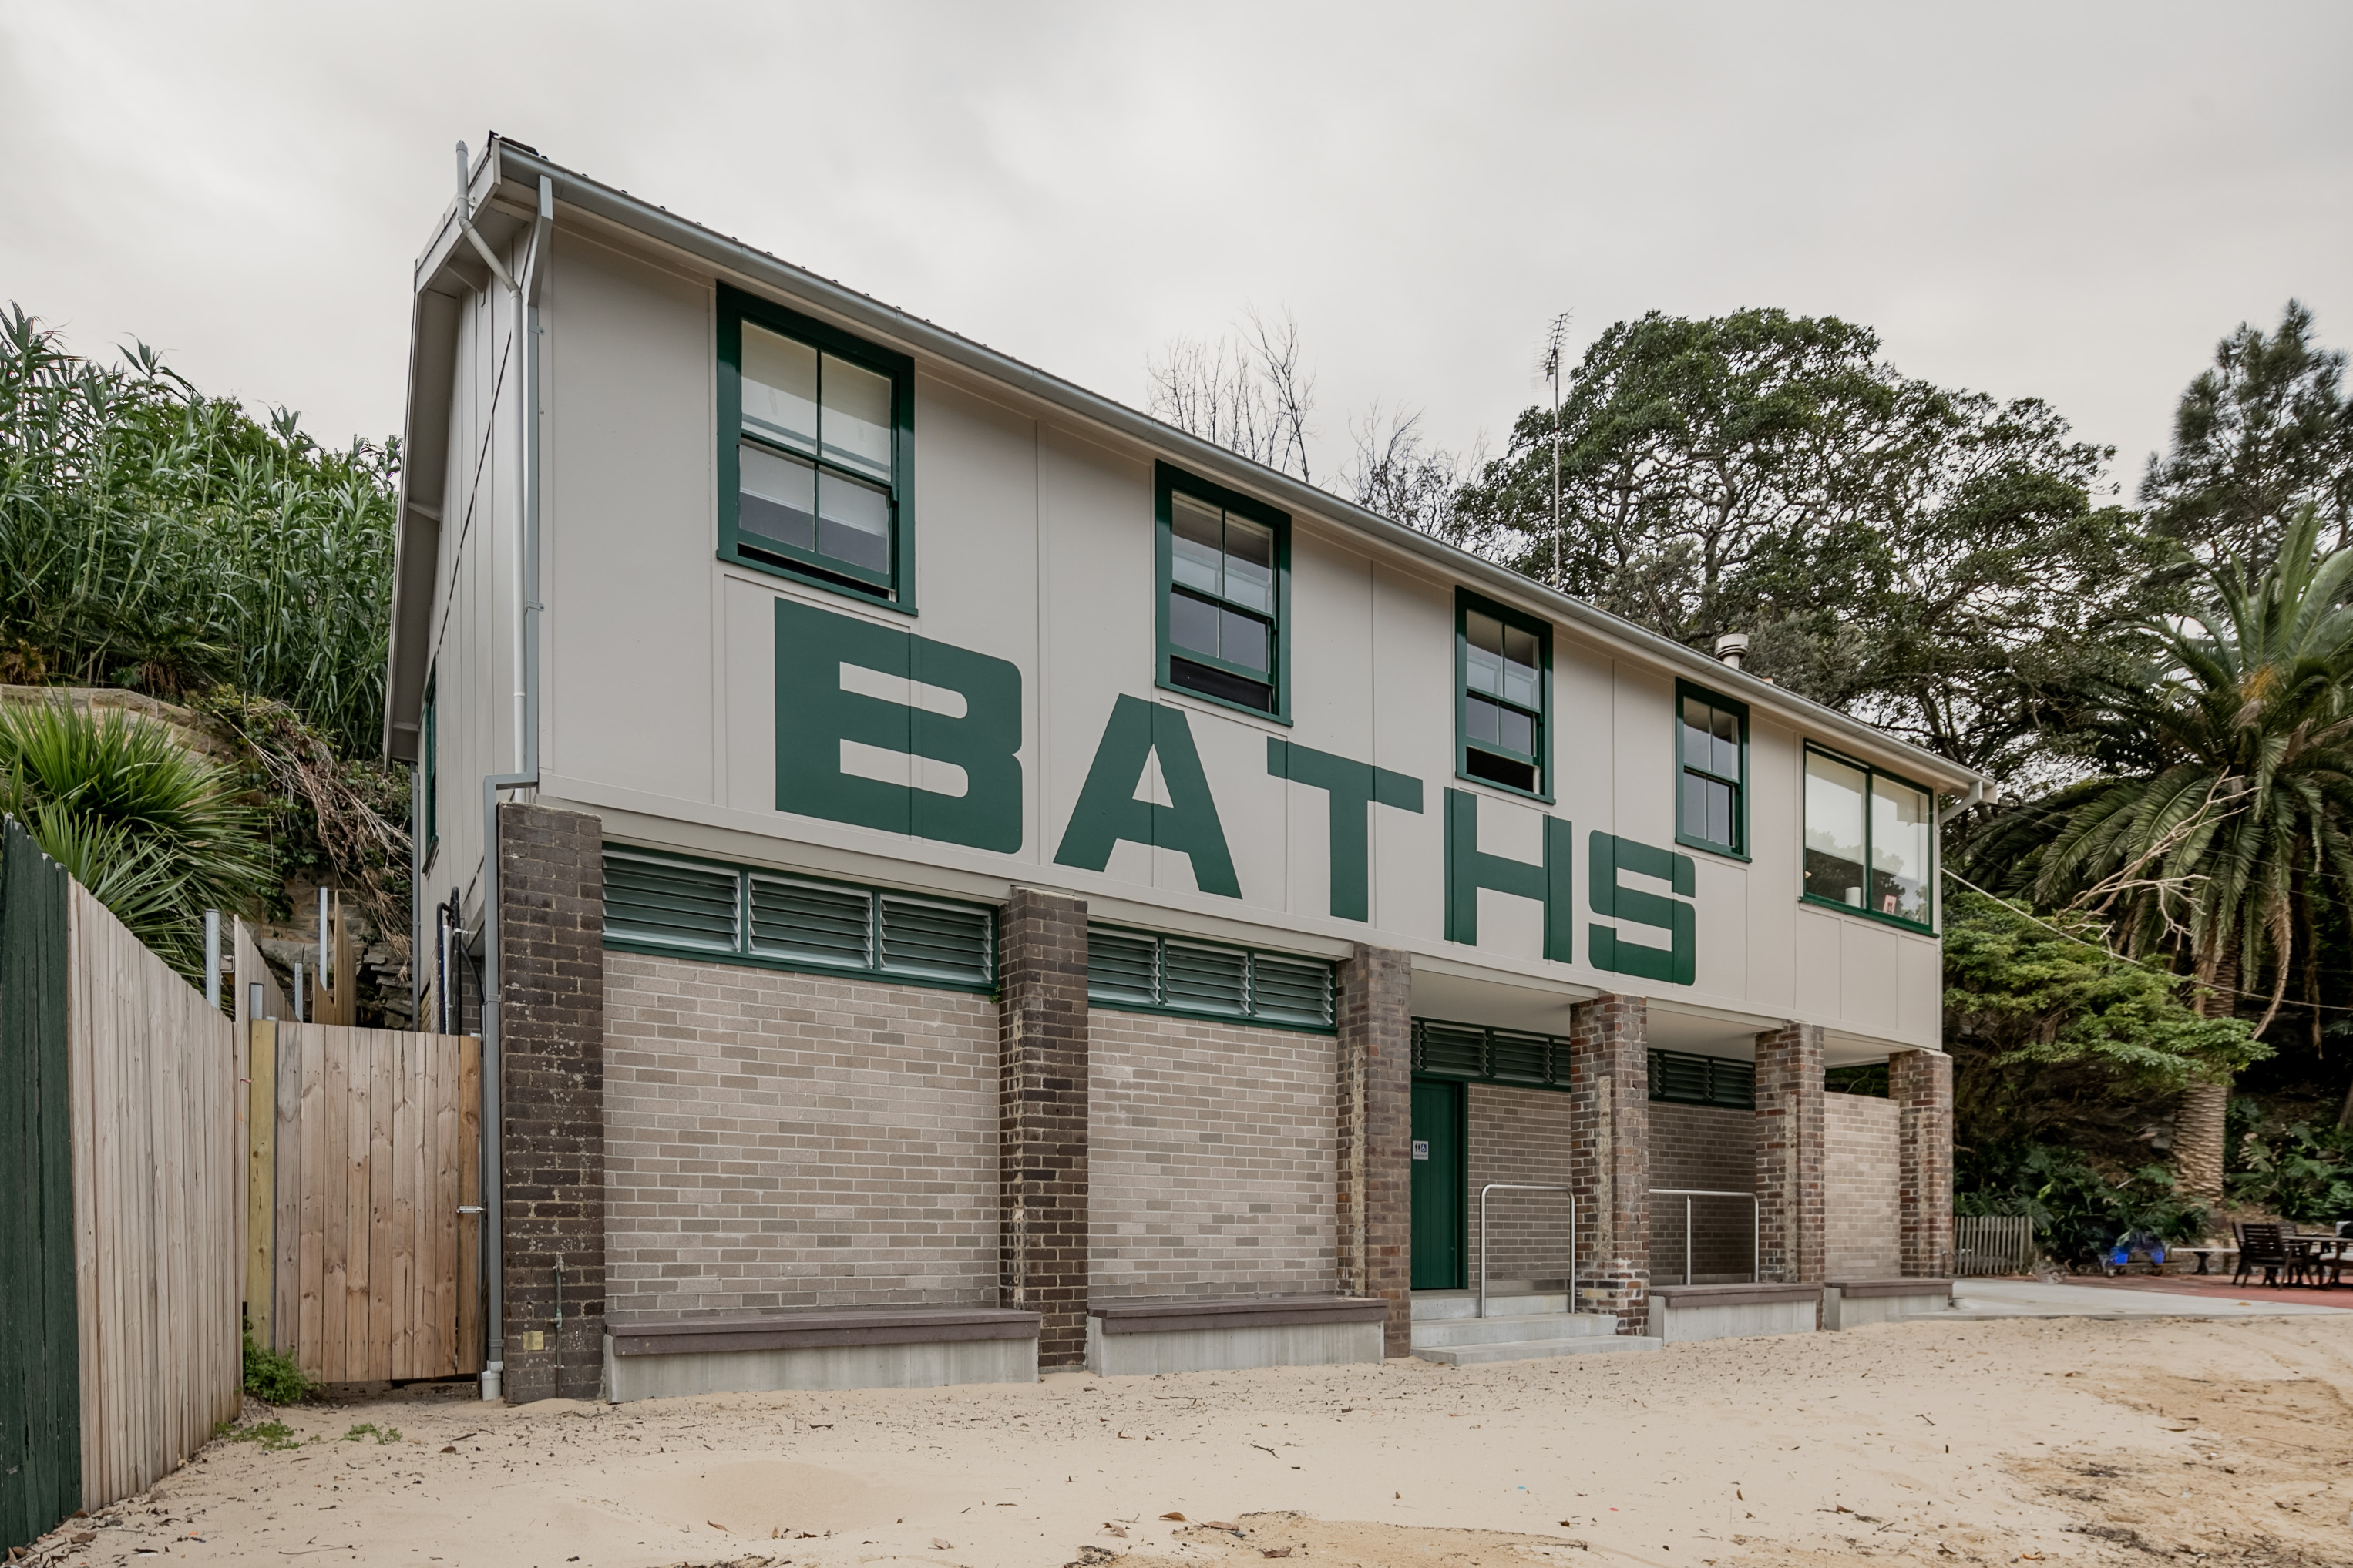 Gez-Xavier-Mansfield-Photography-Avant-Constructions-Greenwich-Baths-Restoration-Project-October2017